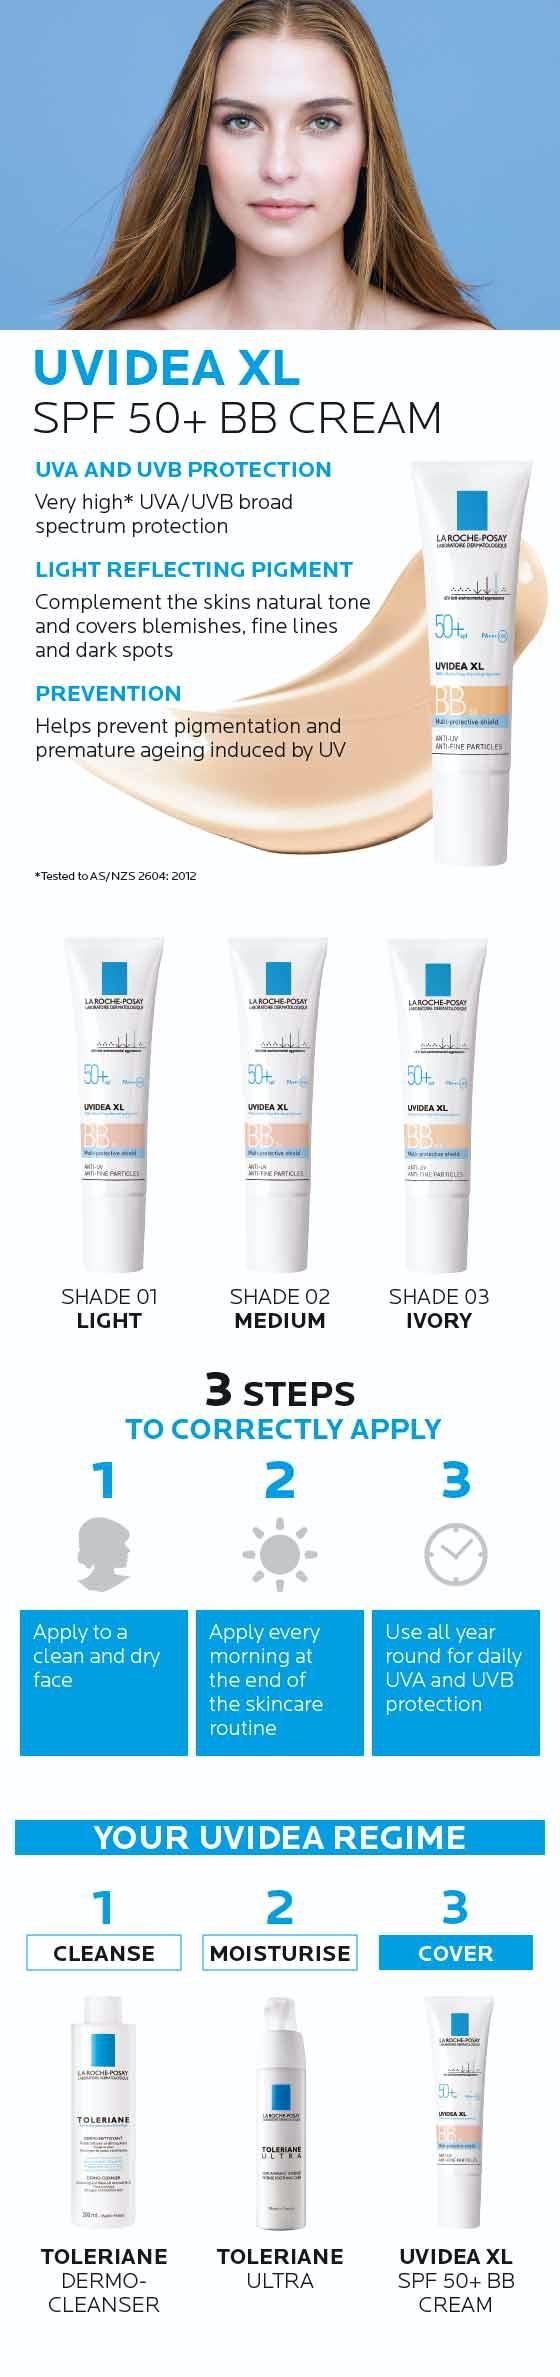 La Roche-Posay Uvidea XL BB Cream Shade 02 Medium 30ml